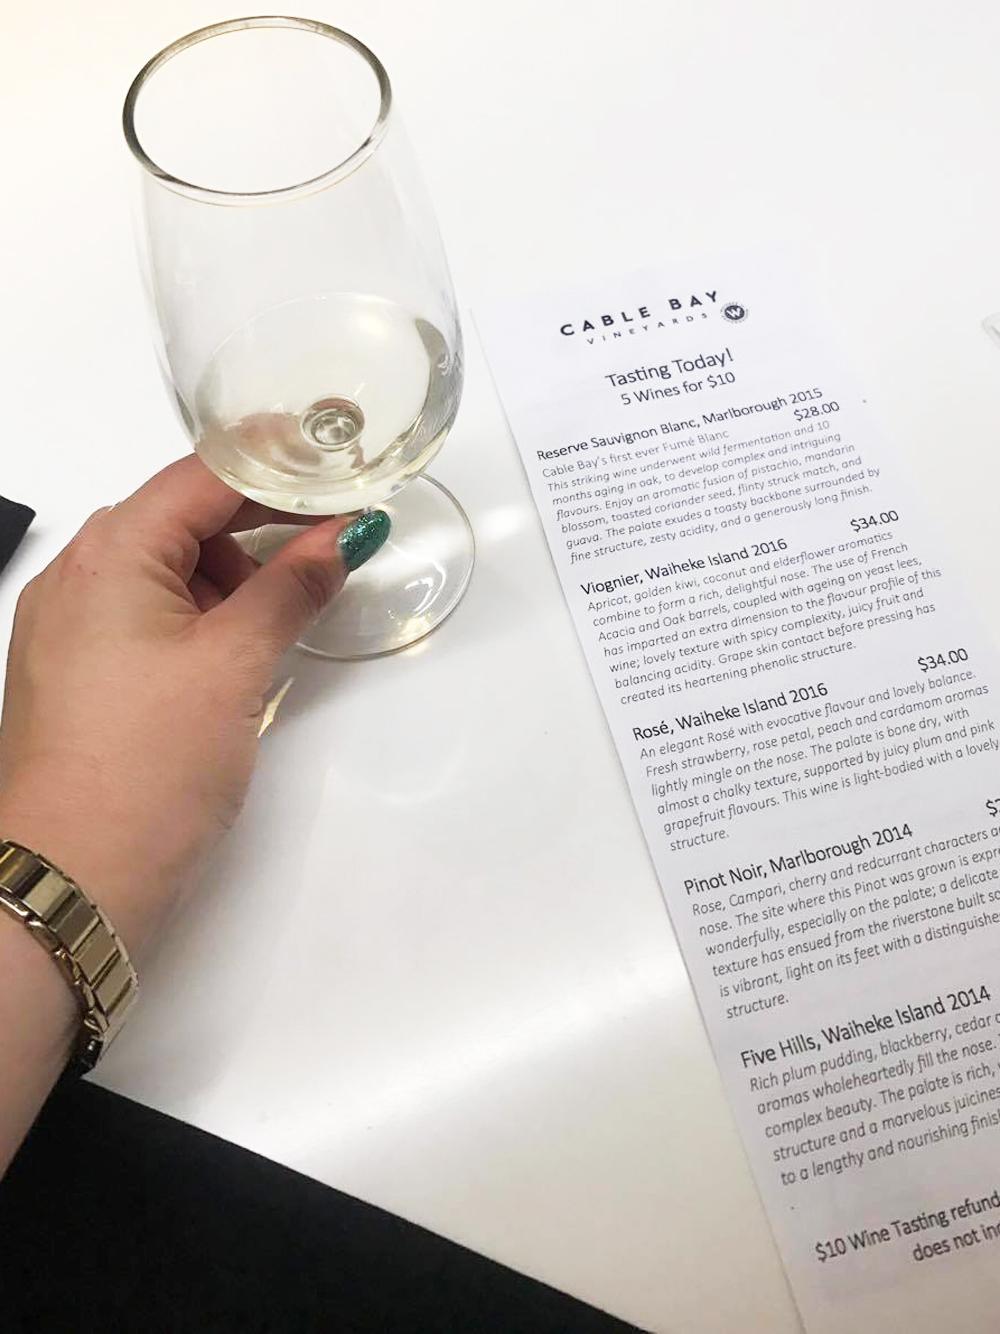 Cable Bay's list of wine tastings